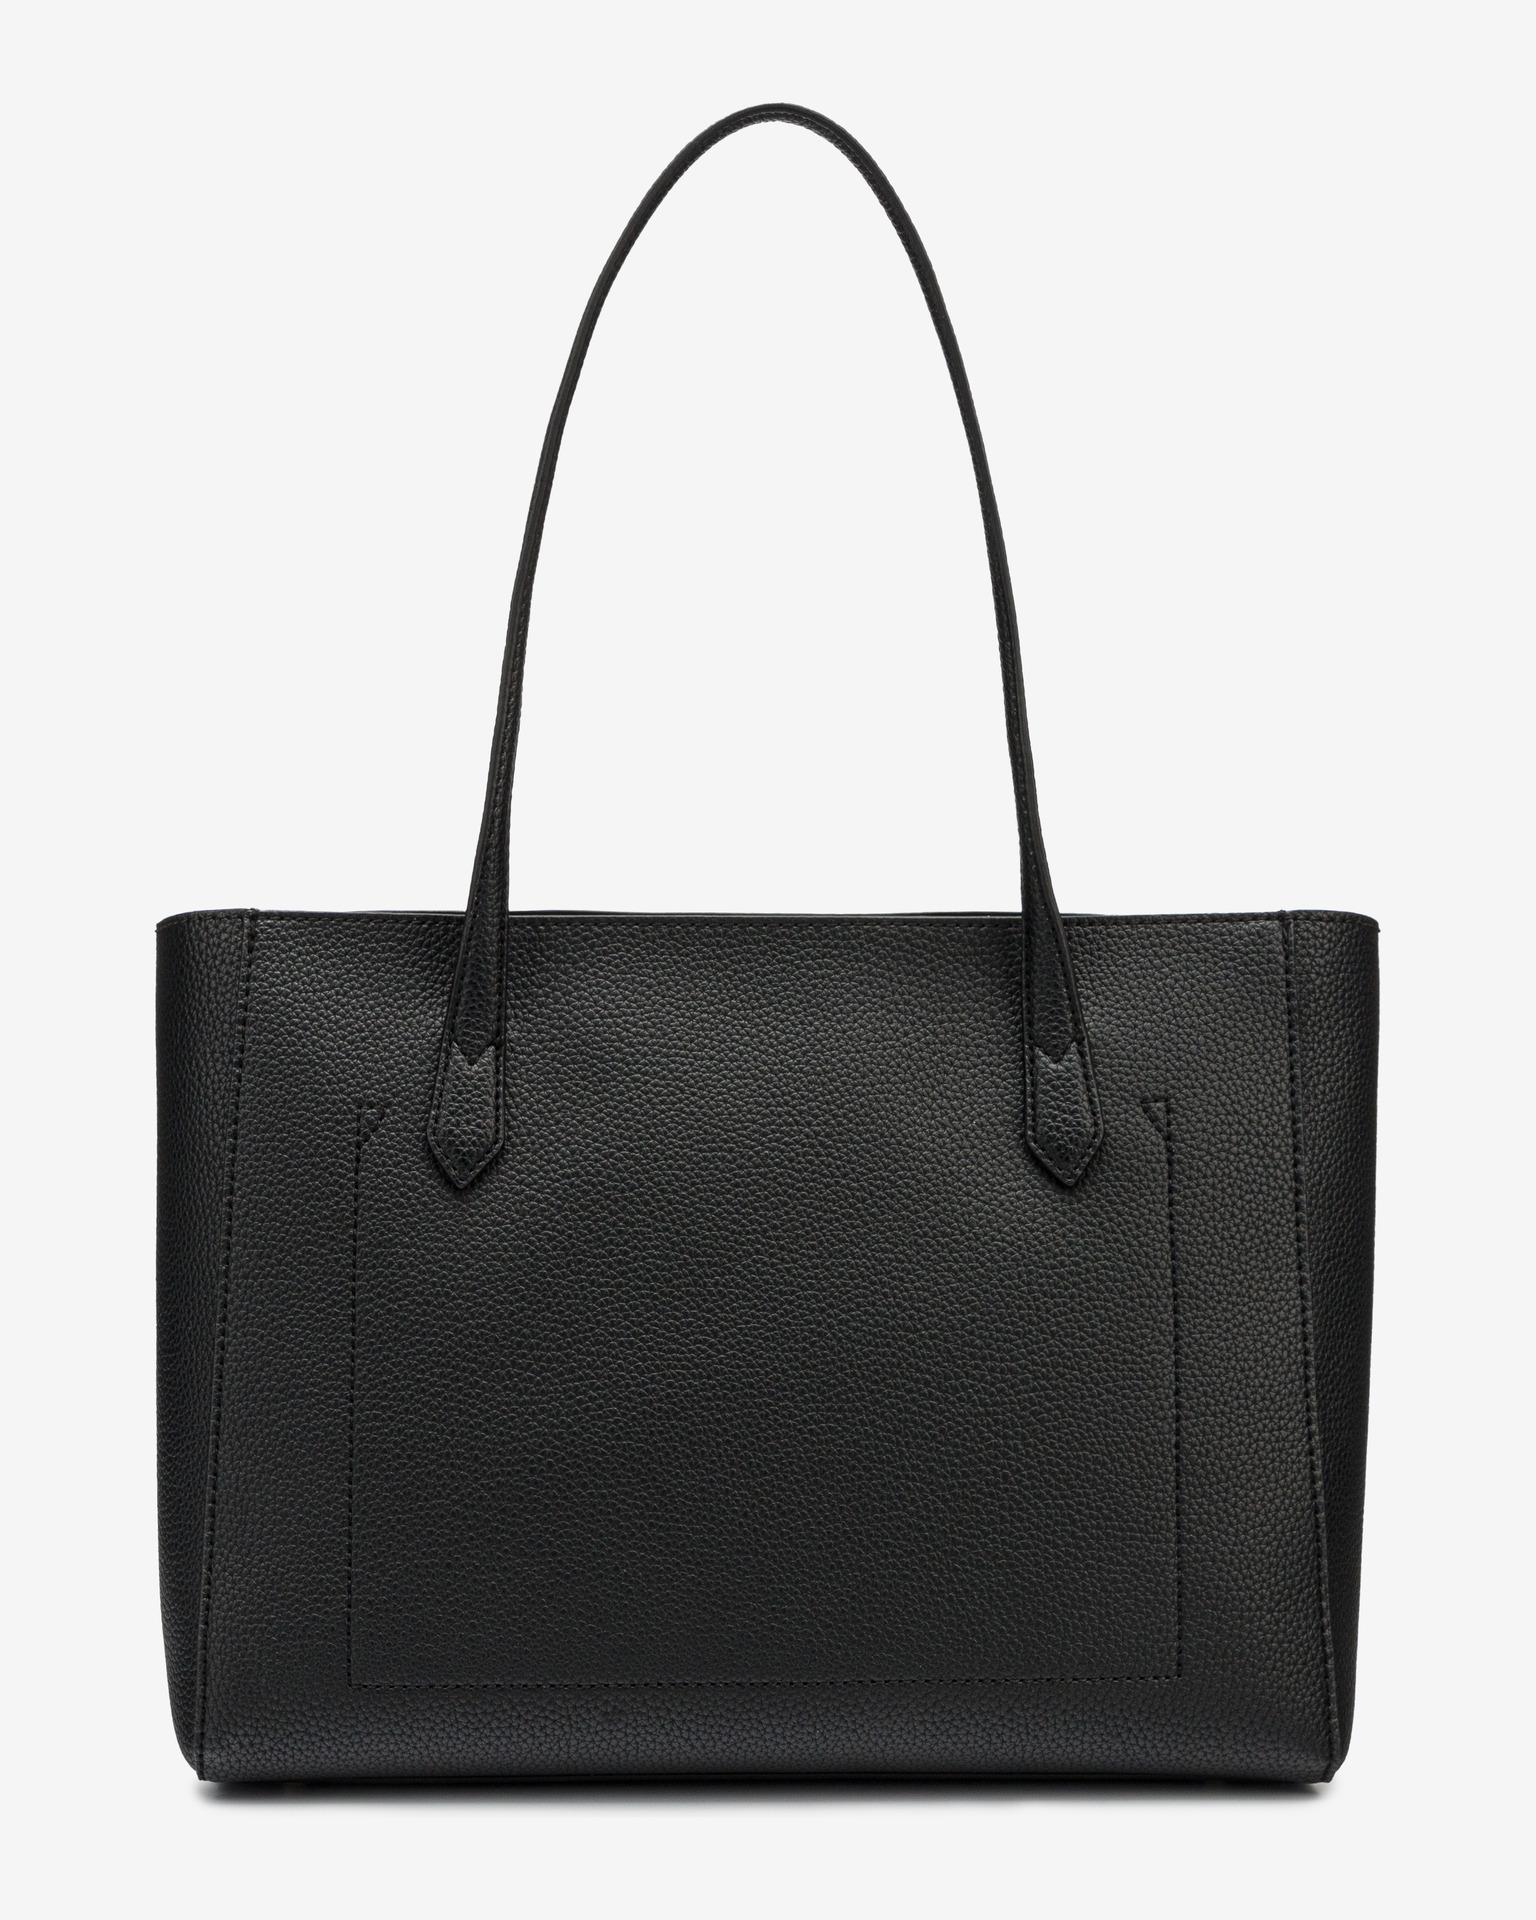 Guess black handbag Uptown Chic Elite